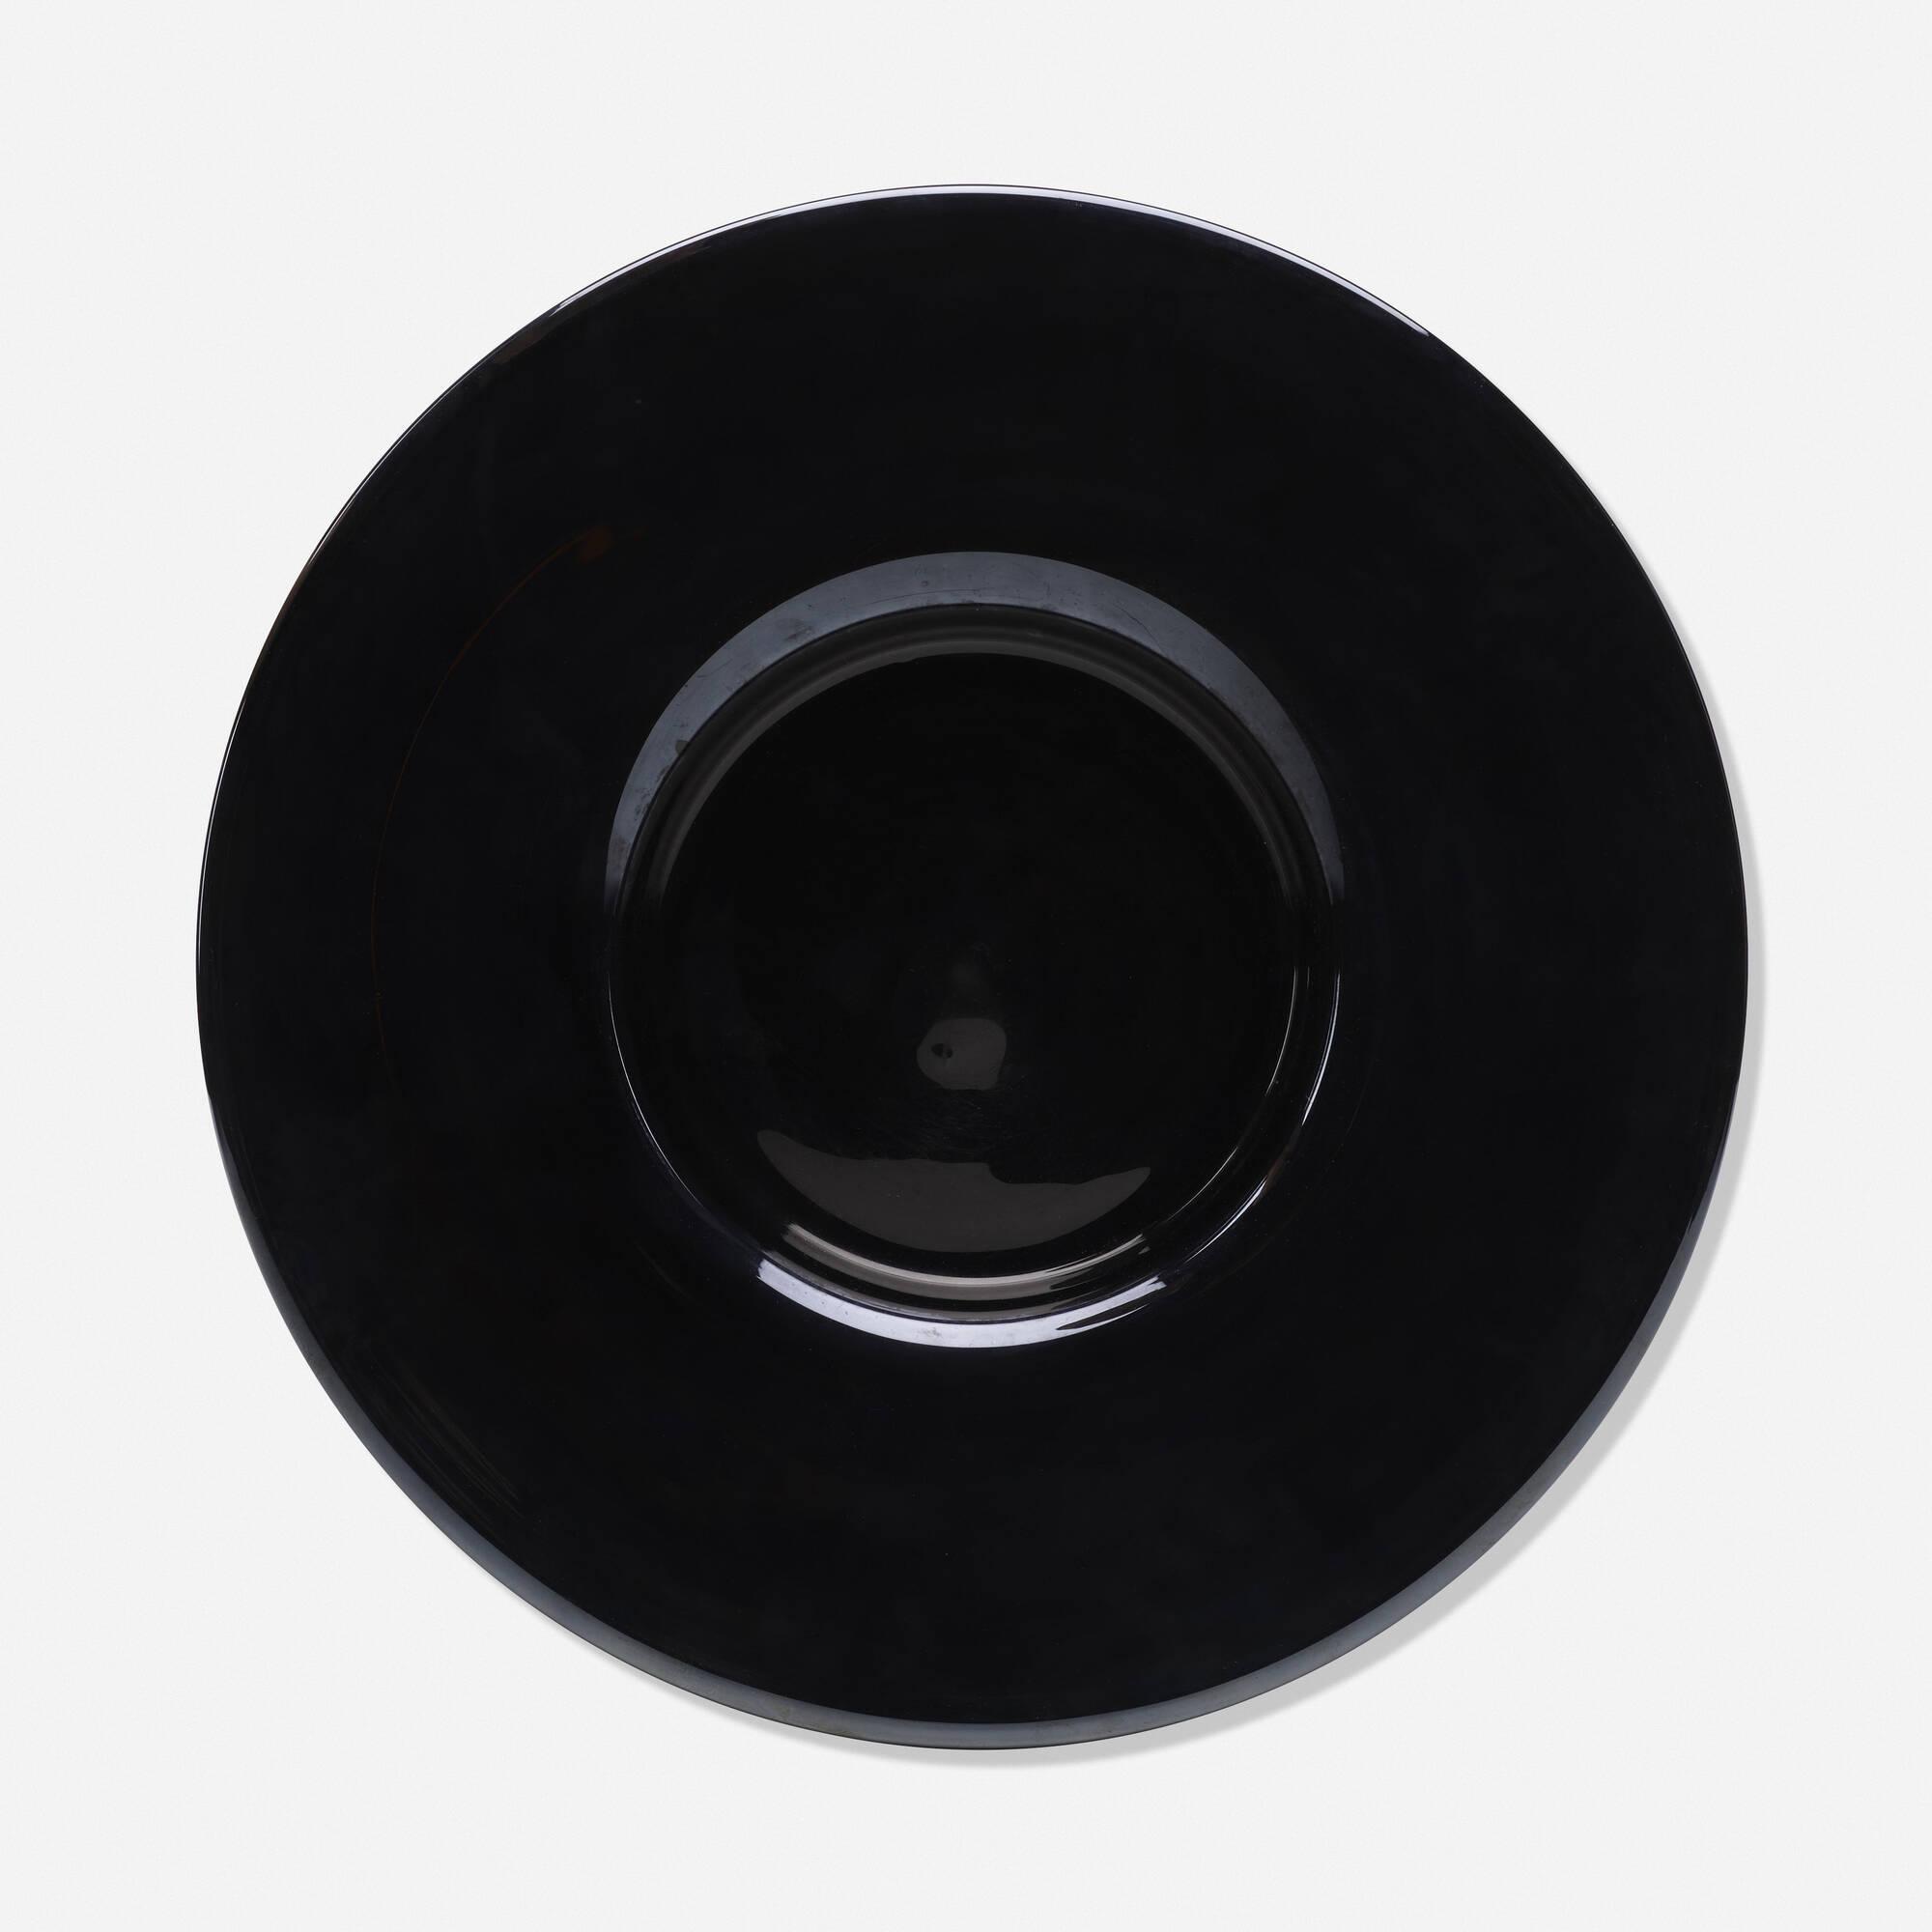 815: Vittorio Zecchin / dish (1 of 2)